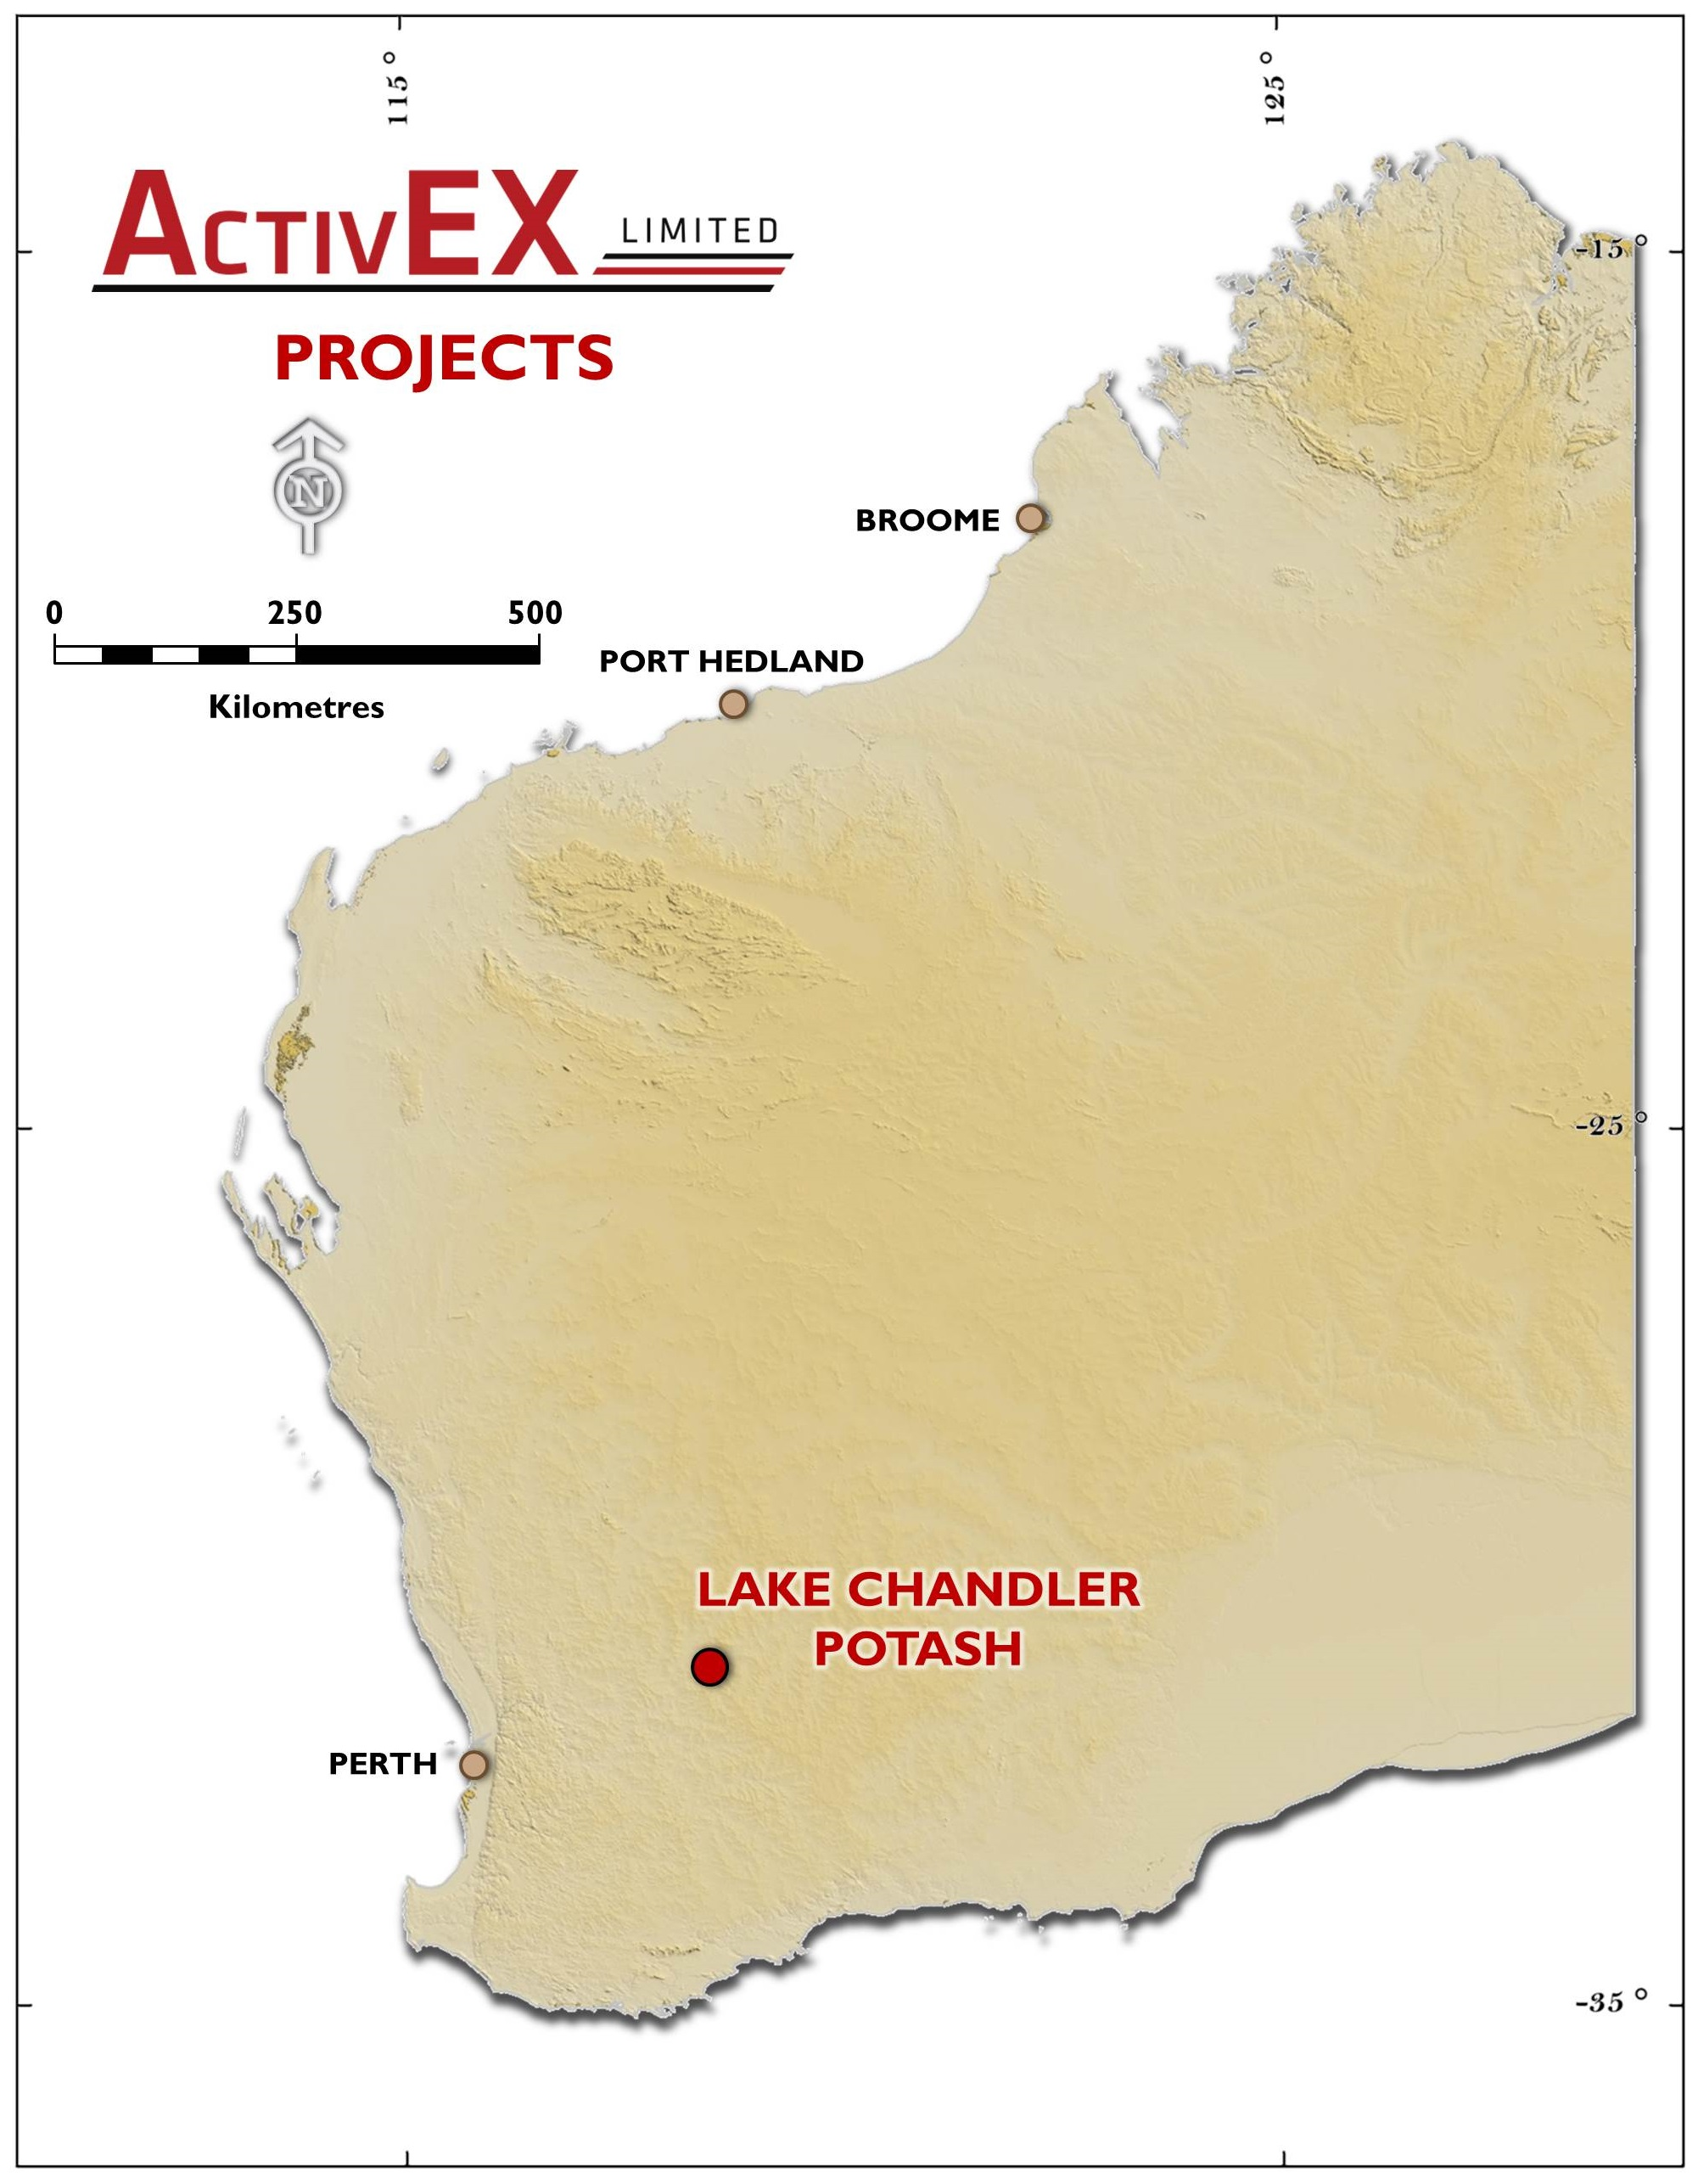 LAKE CHANDLER POTASH | ActivEX Limited